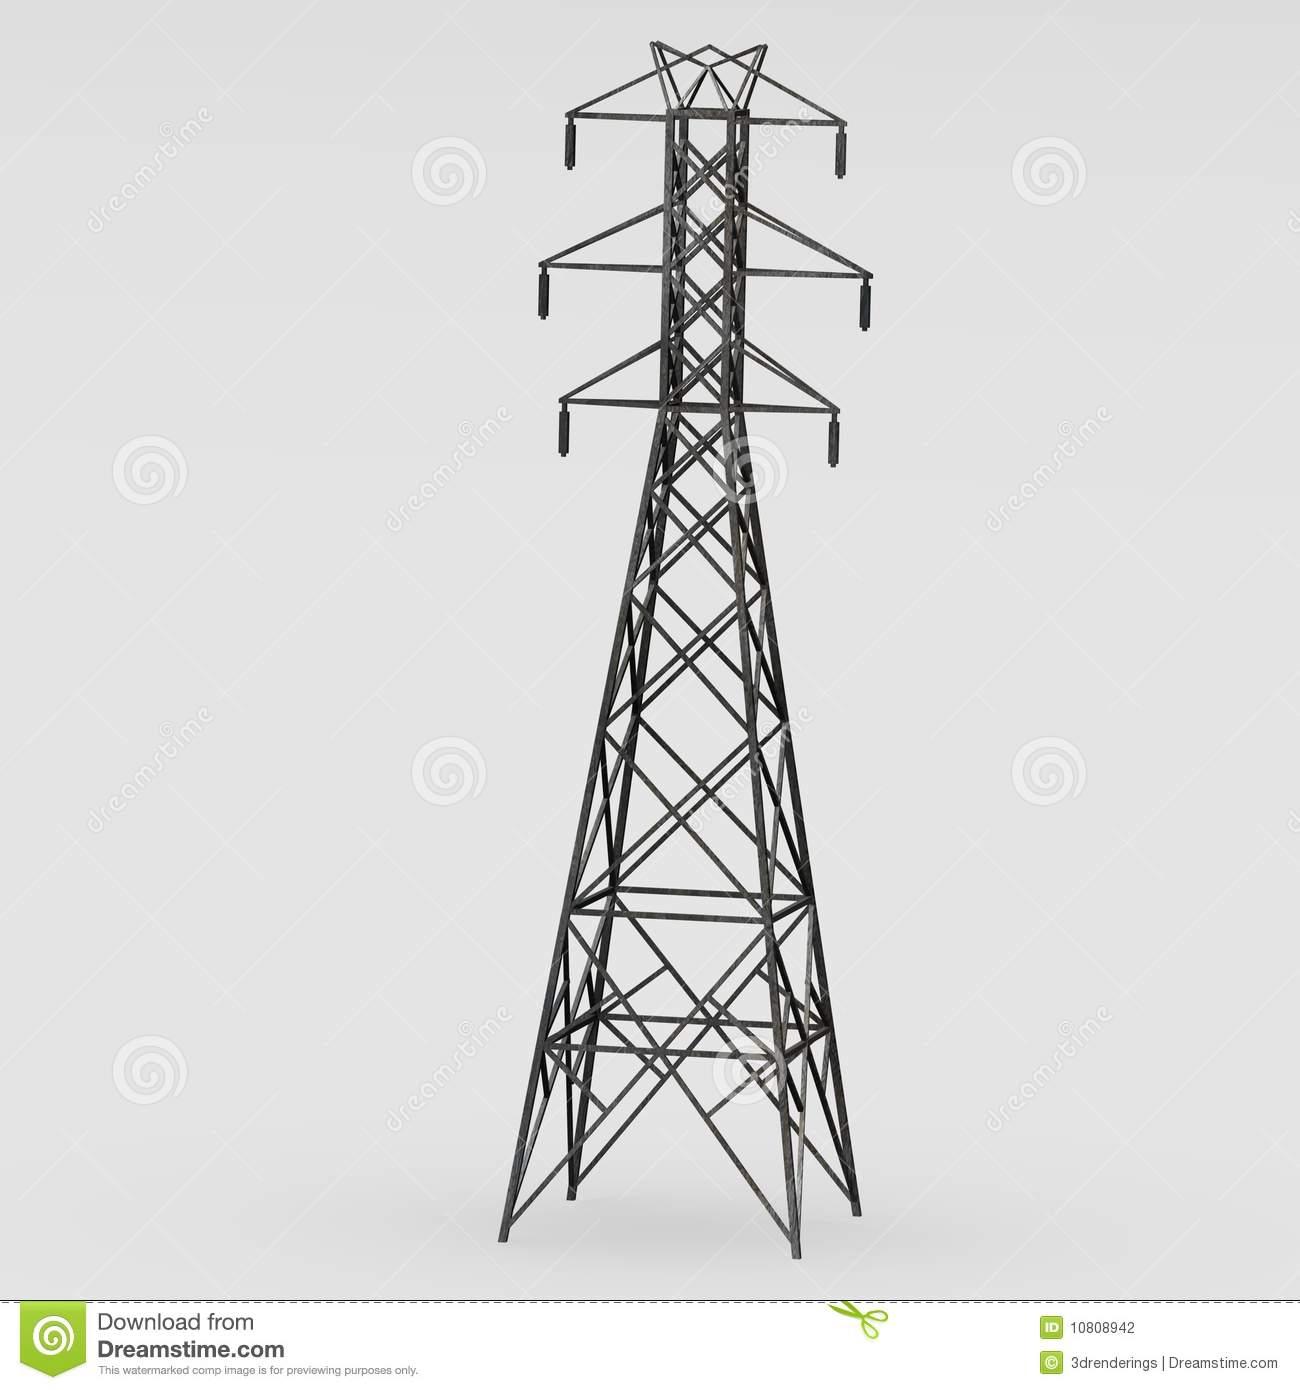 Power Line clipart Clipart Line Power Power Line